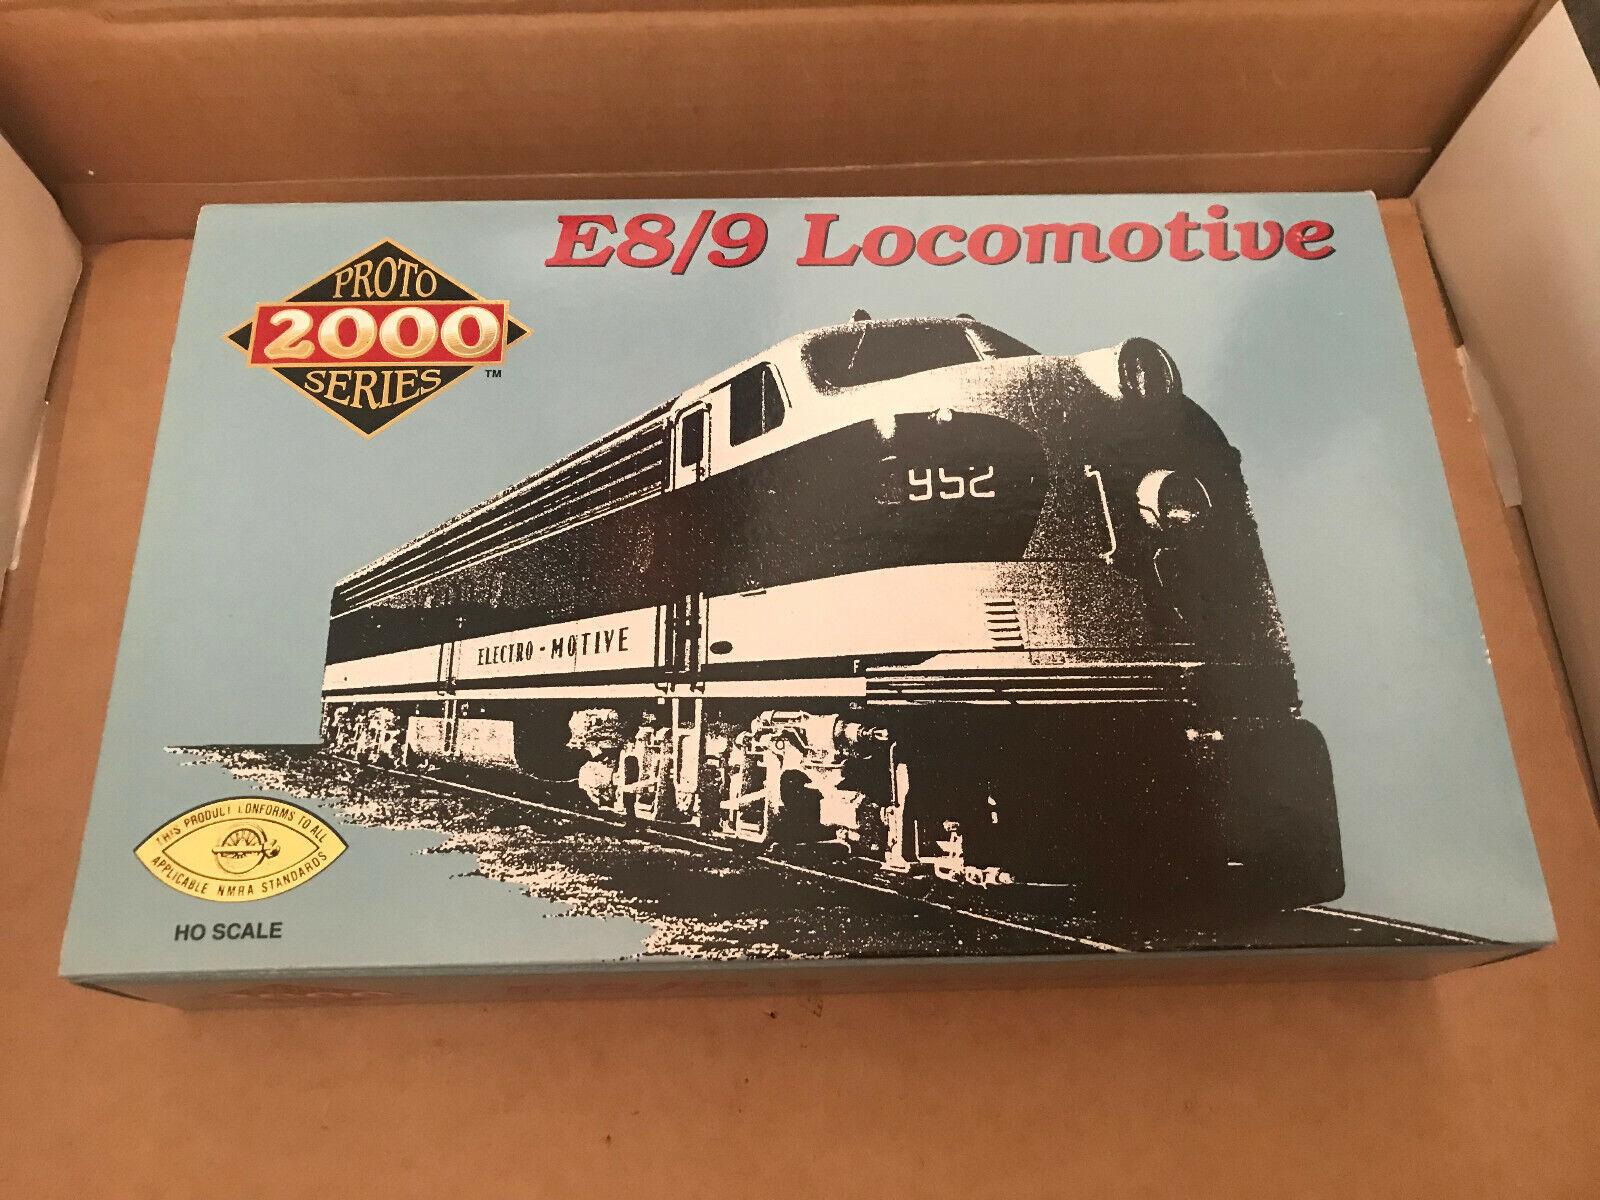 Projoo 2000 Serie 8038 ,Locomotora Diésel E8 9 Der New York Central  4040 Nuevo +